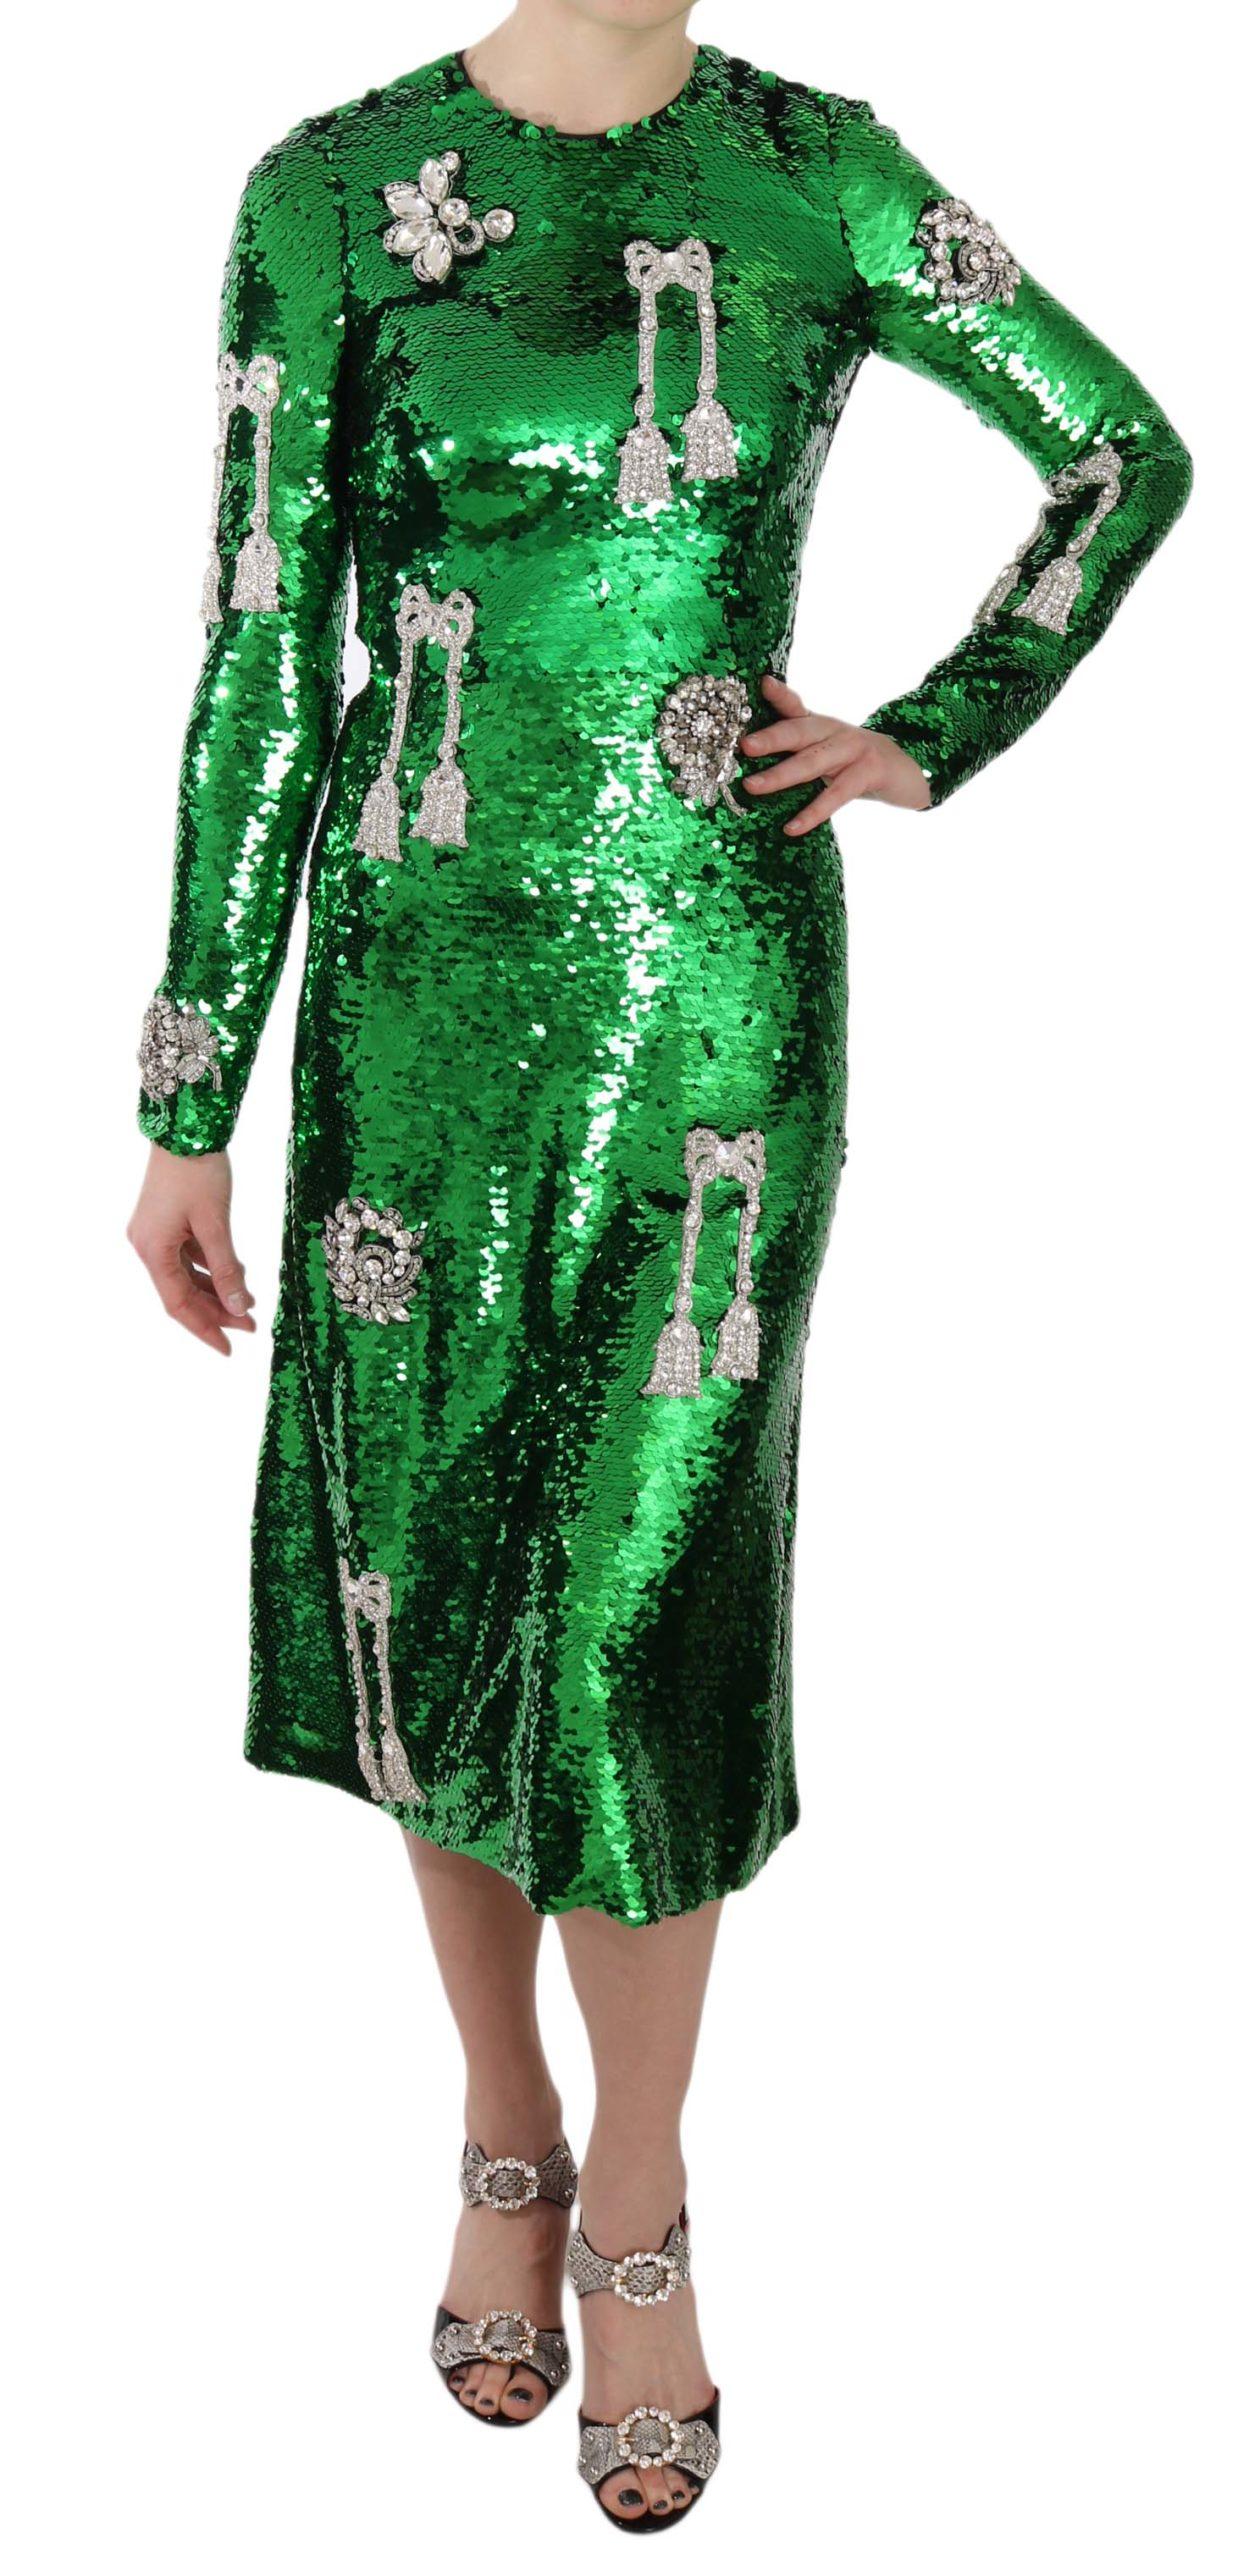 Dolce & Gabbana Women's Sequin Swarovski Crystal Dress Green DR1642 - IT38|XS